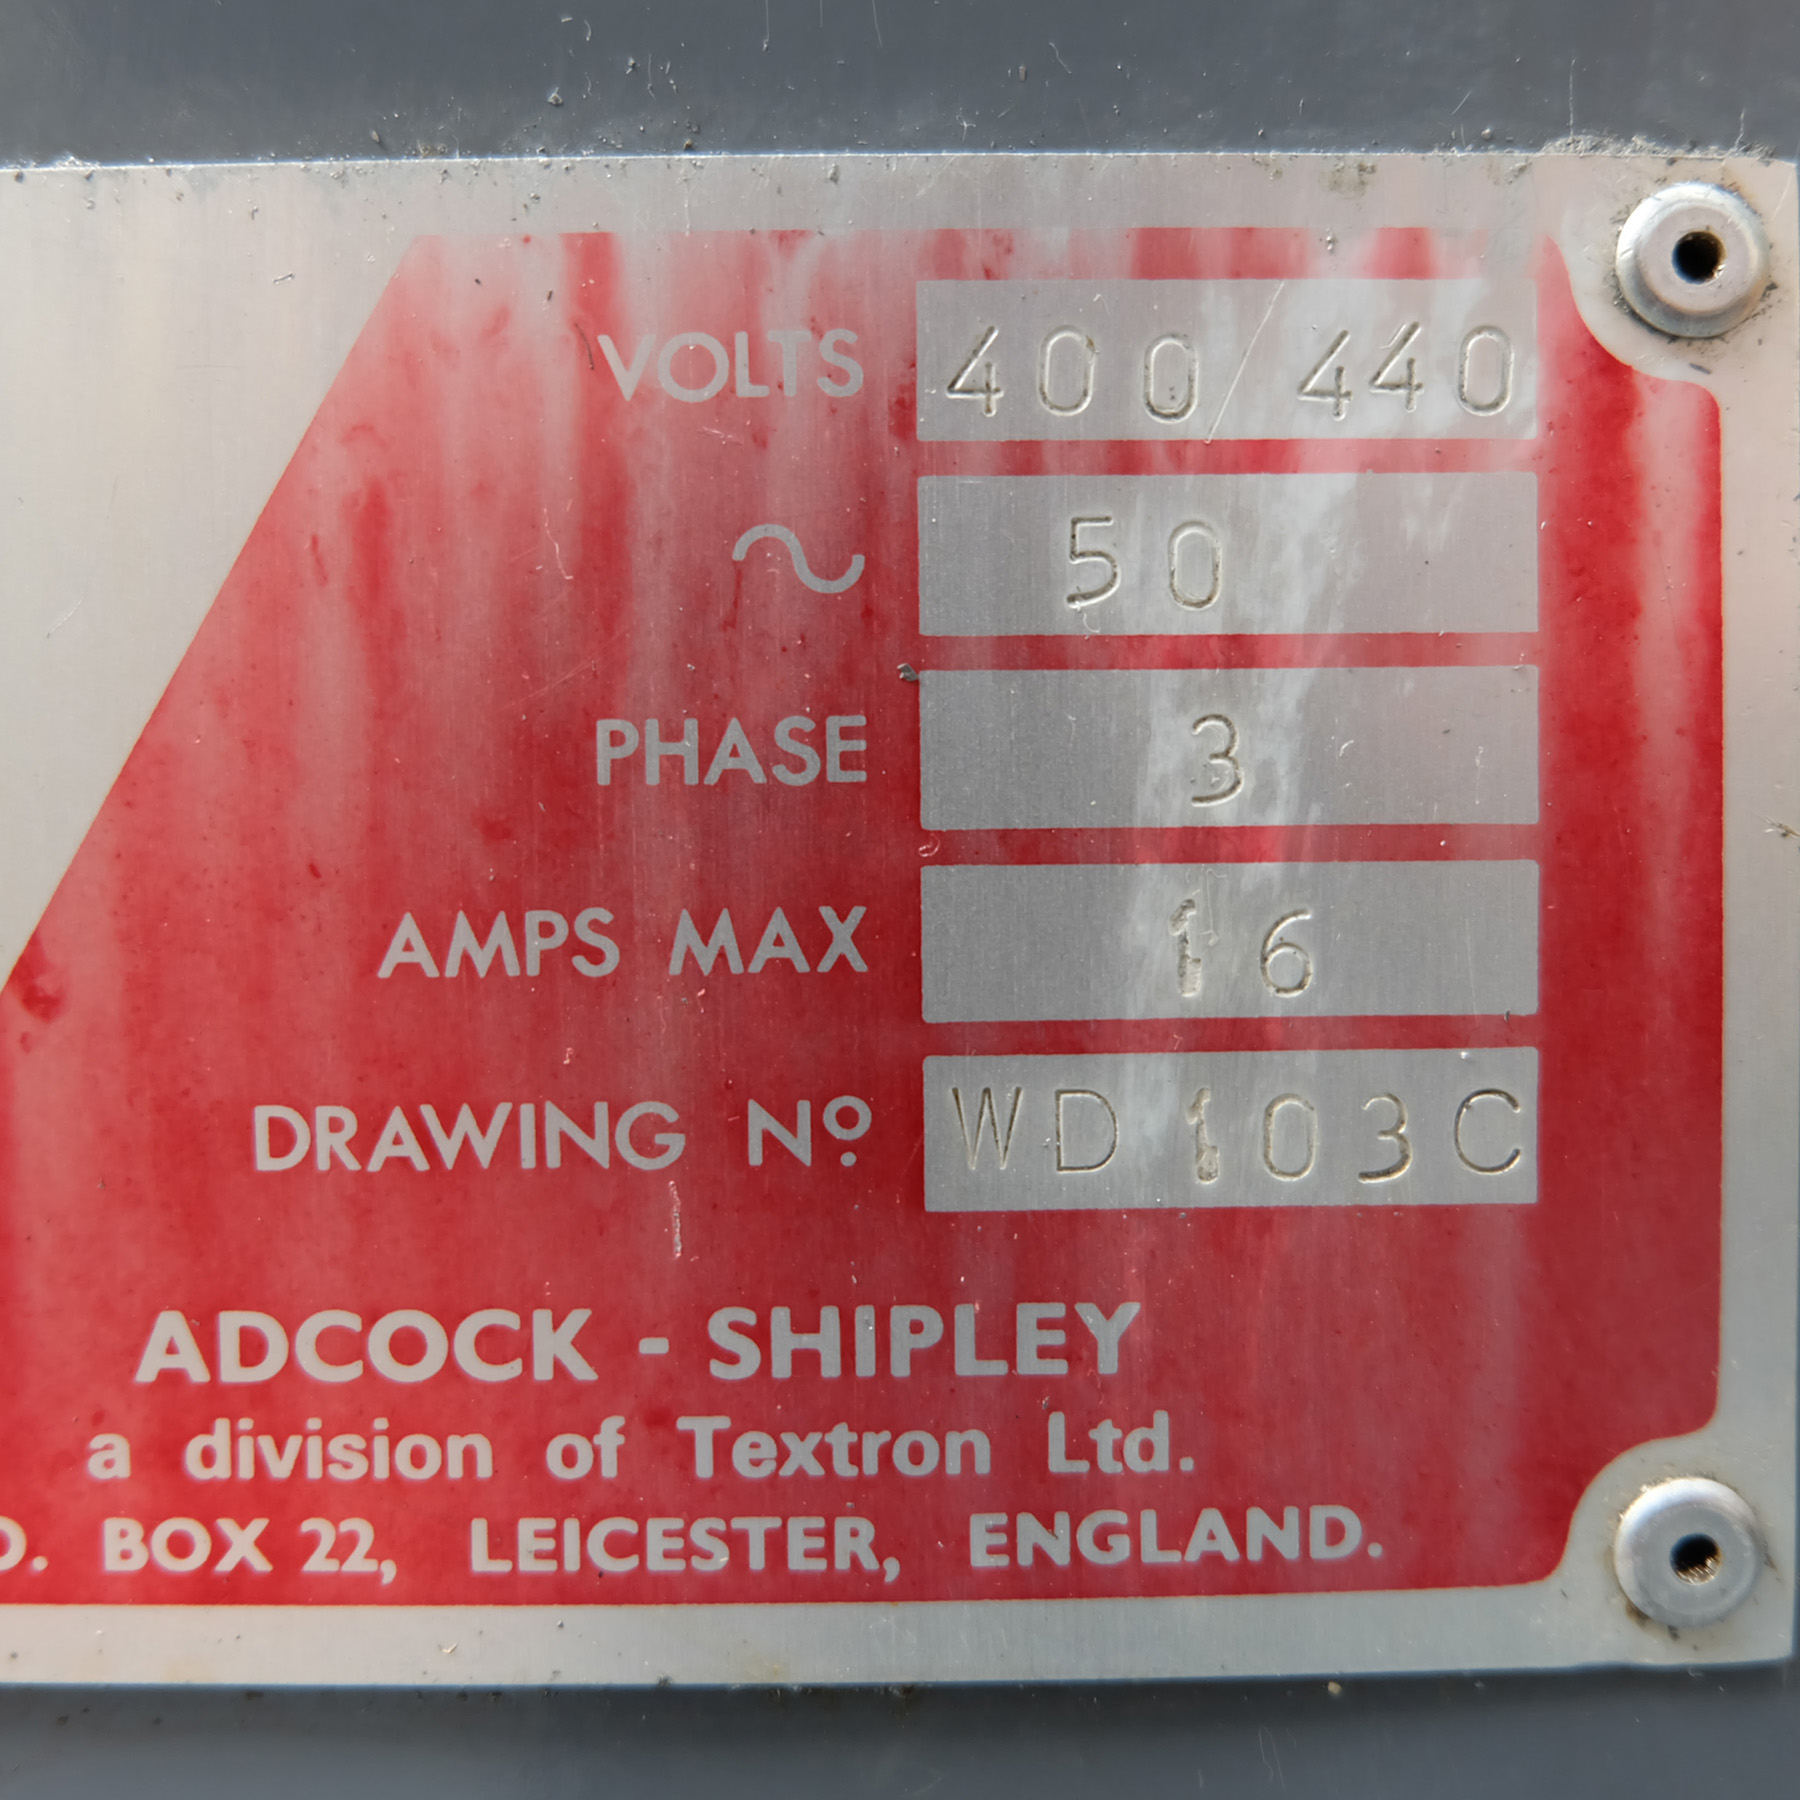 "Bridgeport J Type Turret Miller. Table Size 42"" x 9"". - Image 11 of 13"